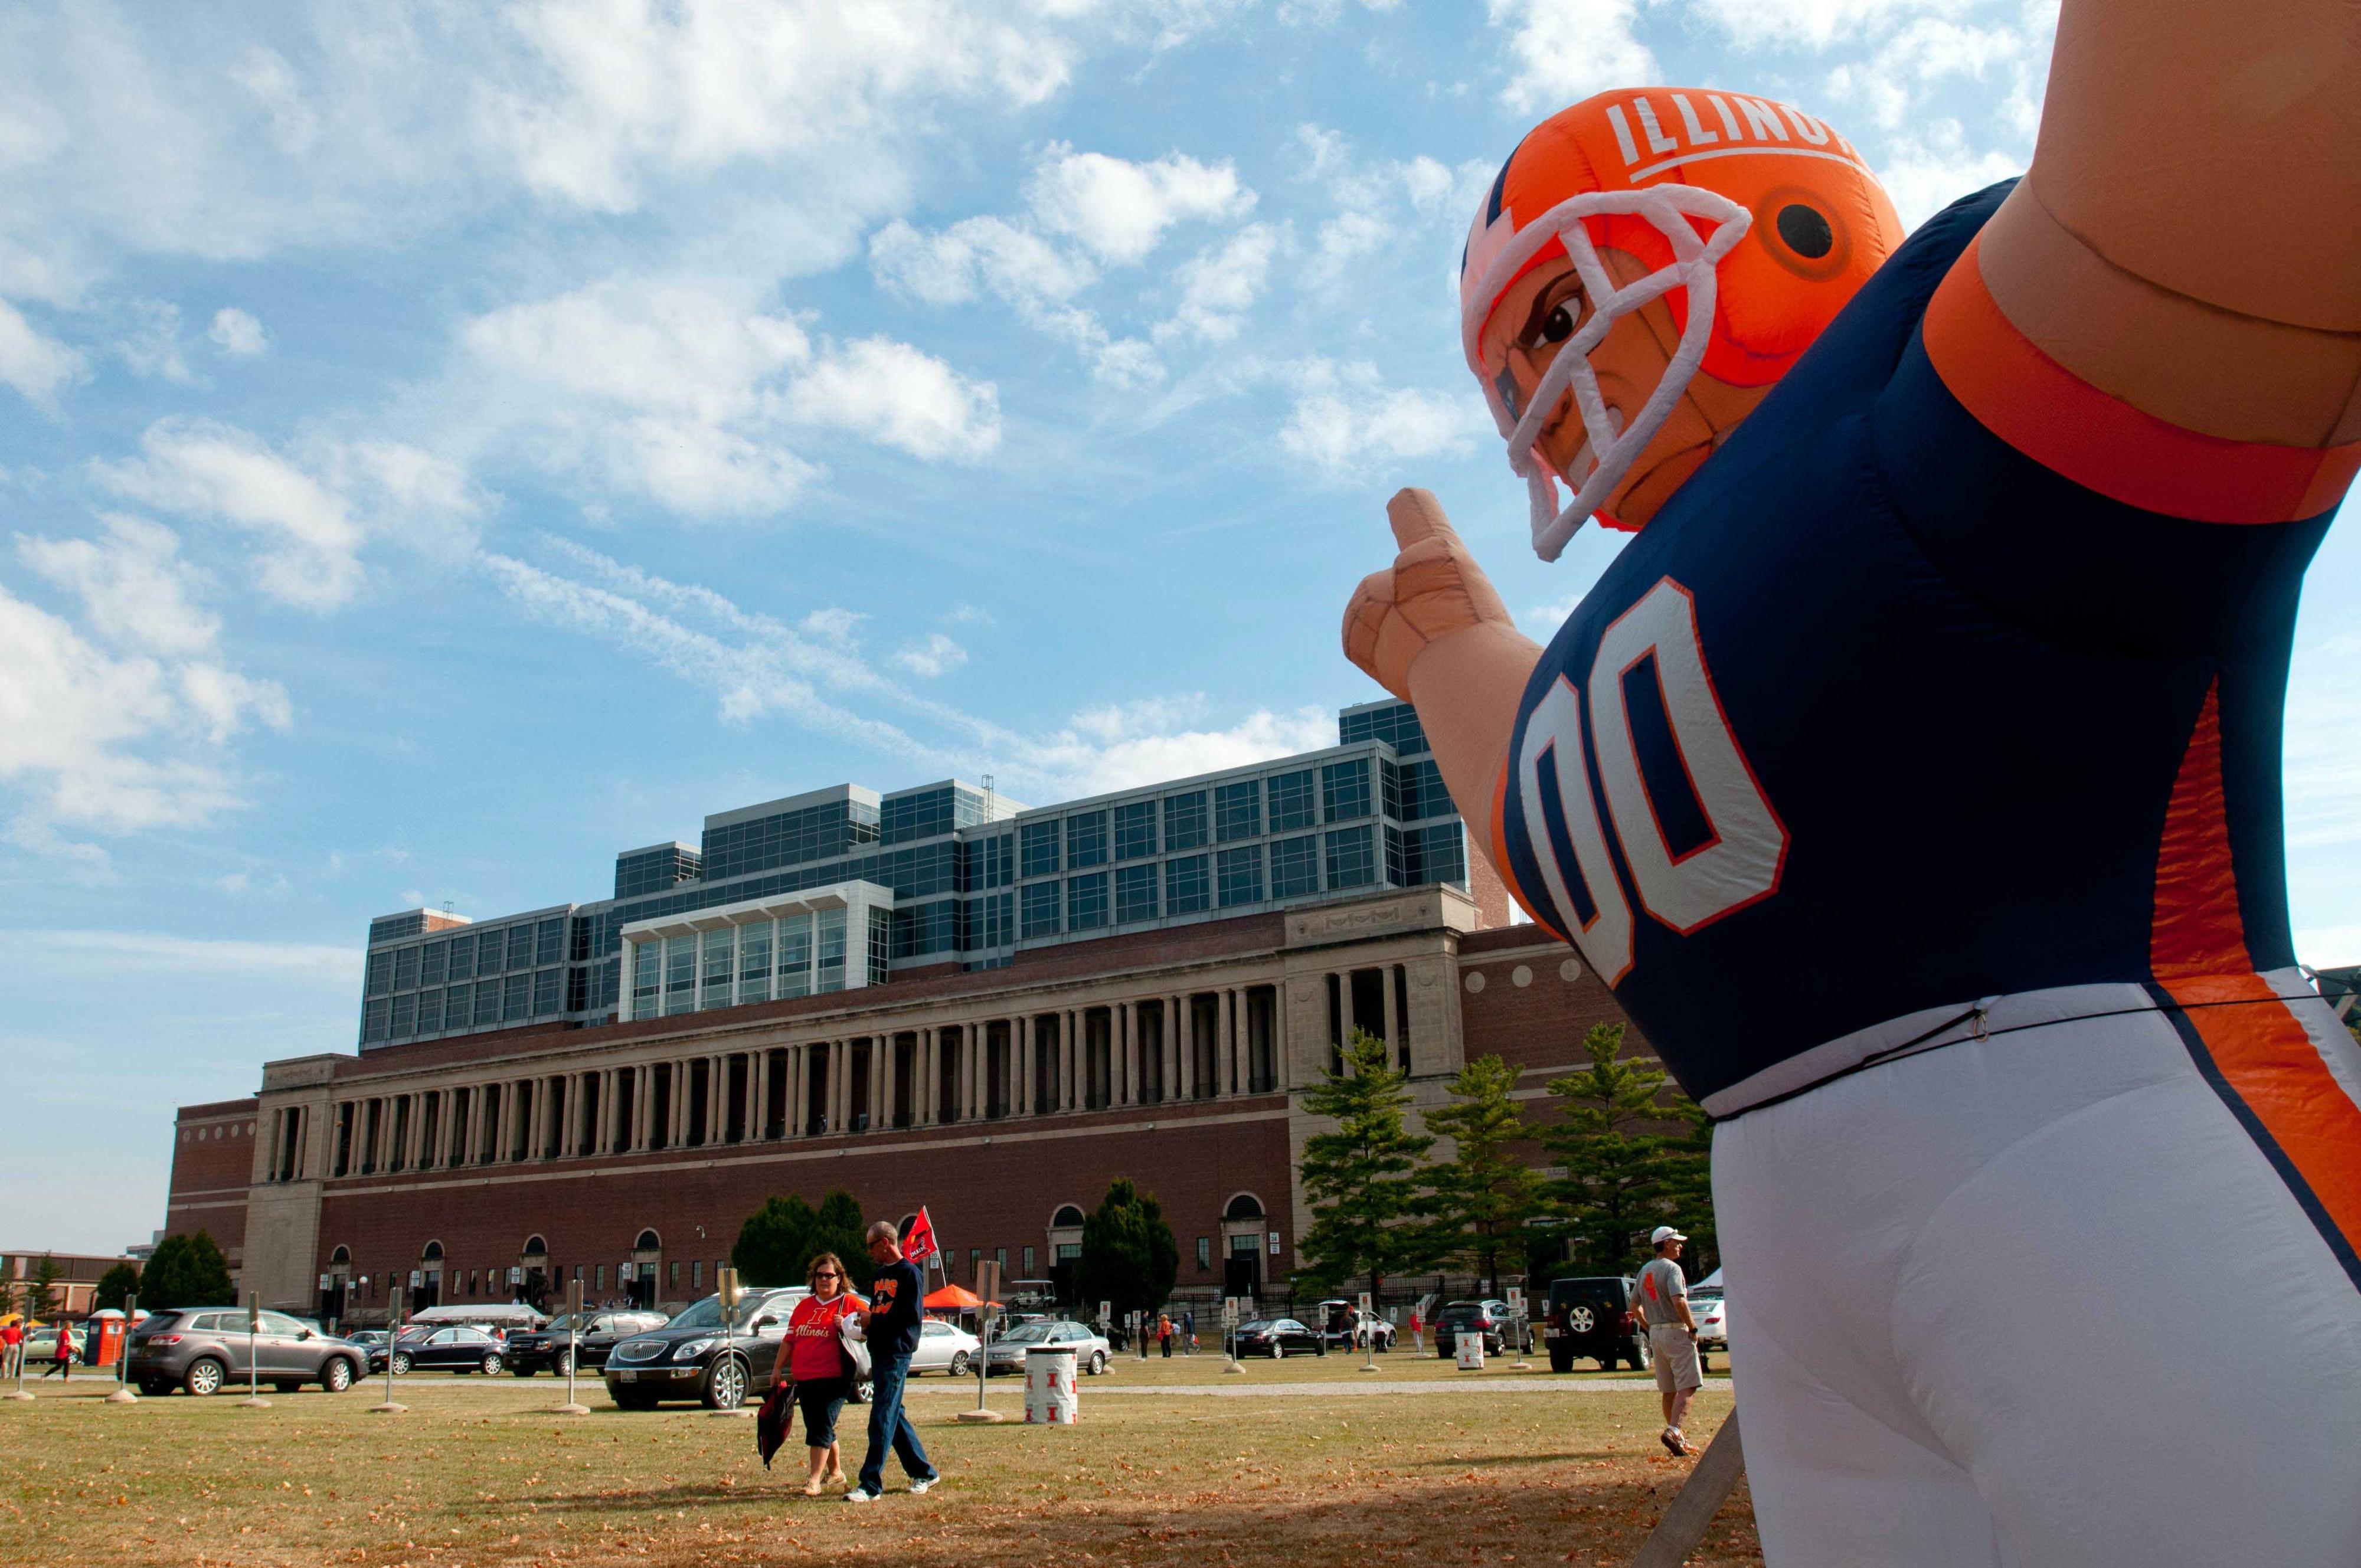 Big Illinois balloon player is big.